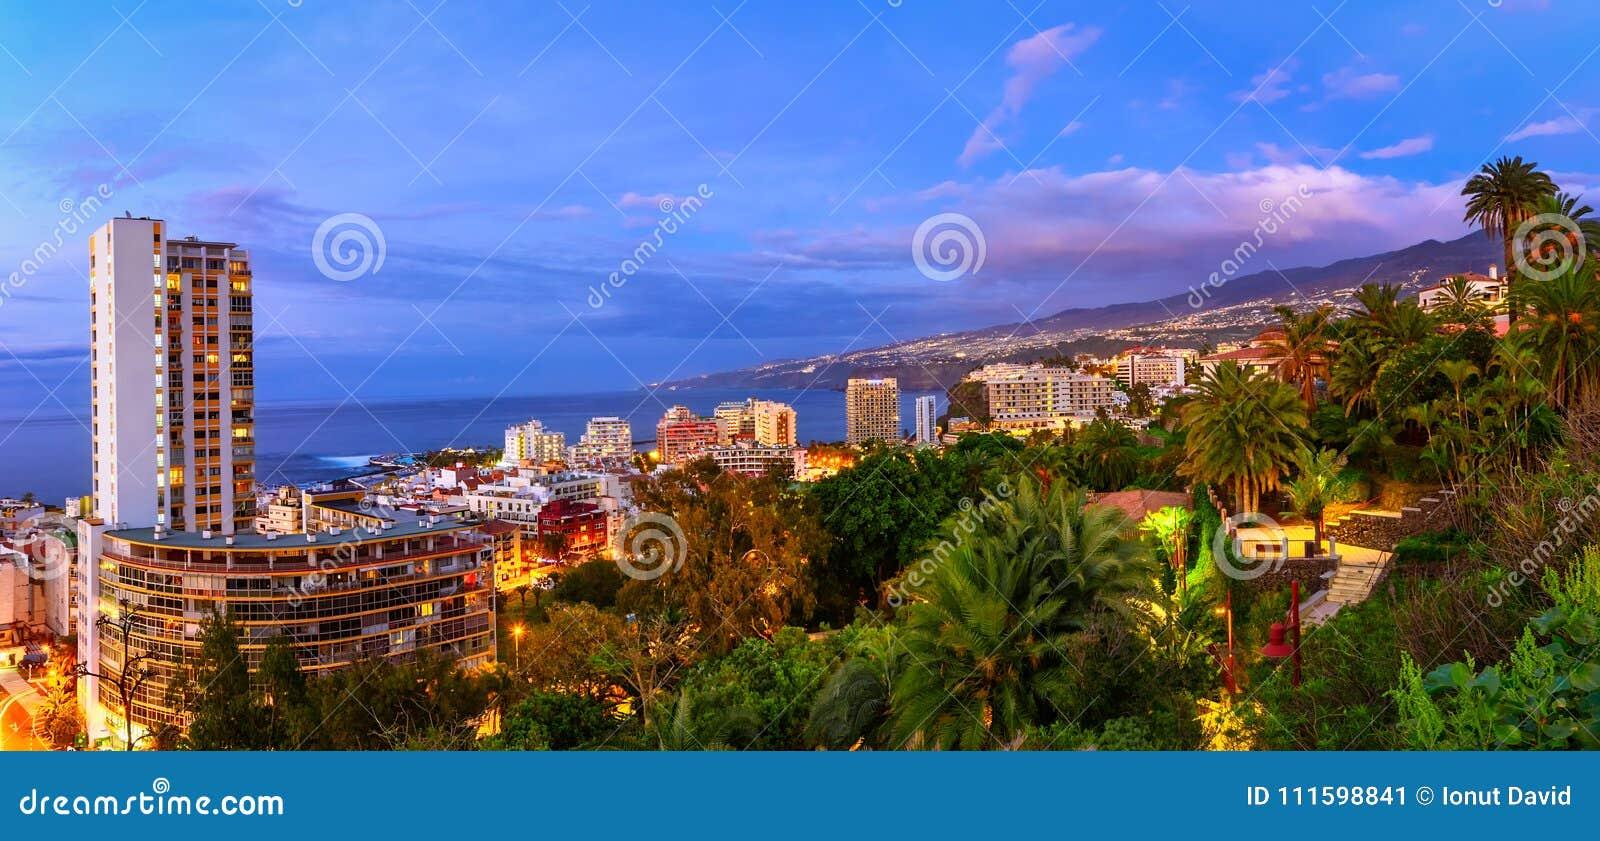 Puerto De La Cruz, Tenerife, wyspy kanaryjska, Hiszpania: Widok nad th